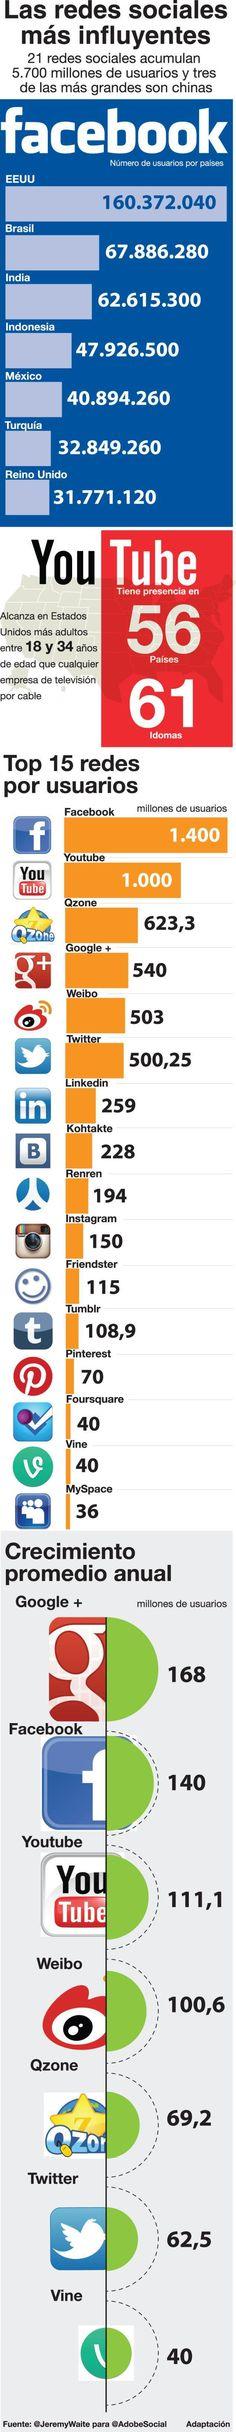 #Infografia Las #redessociales más influyentes. #TAVnews